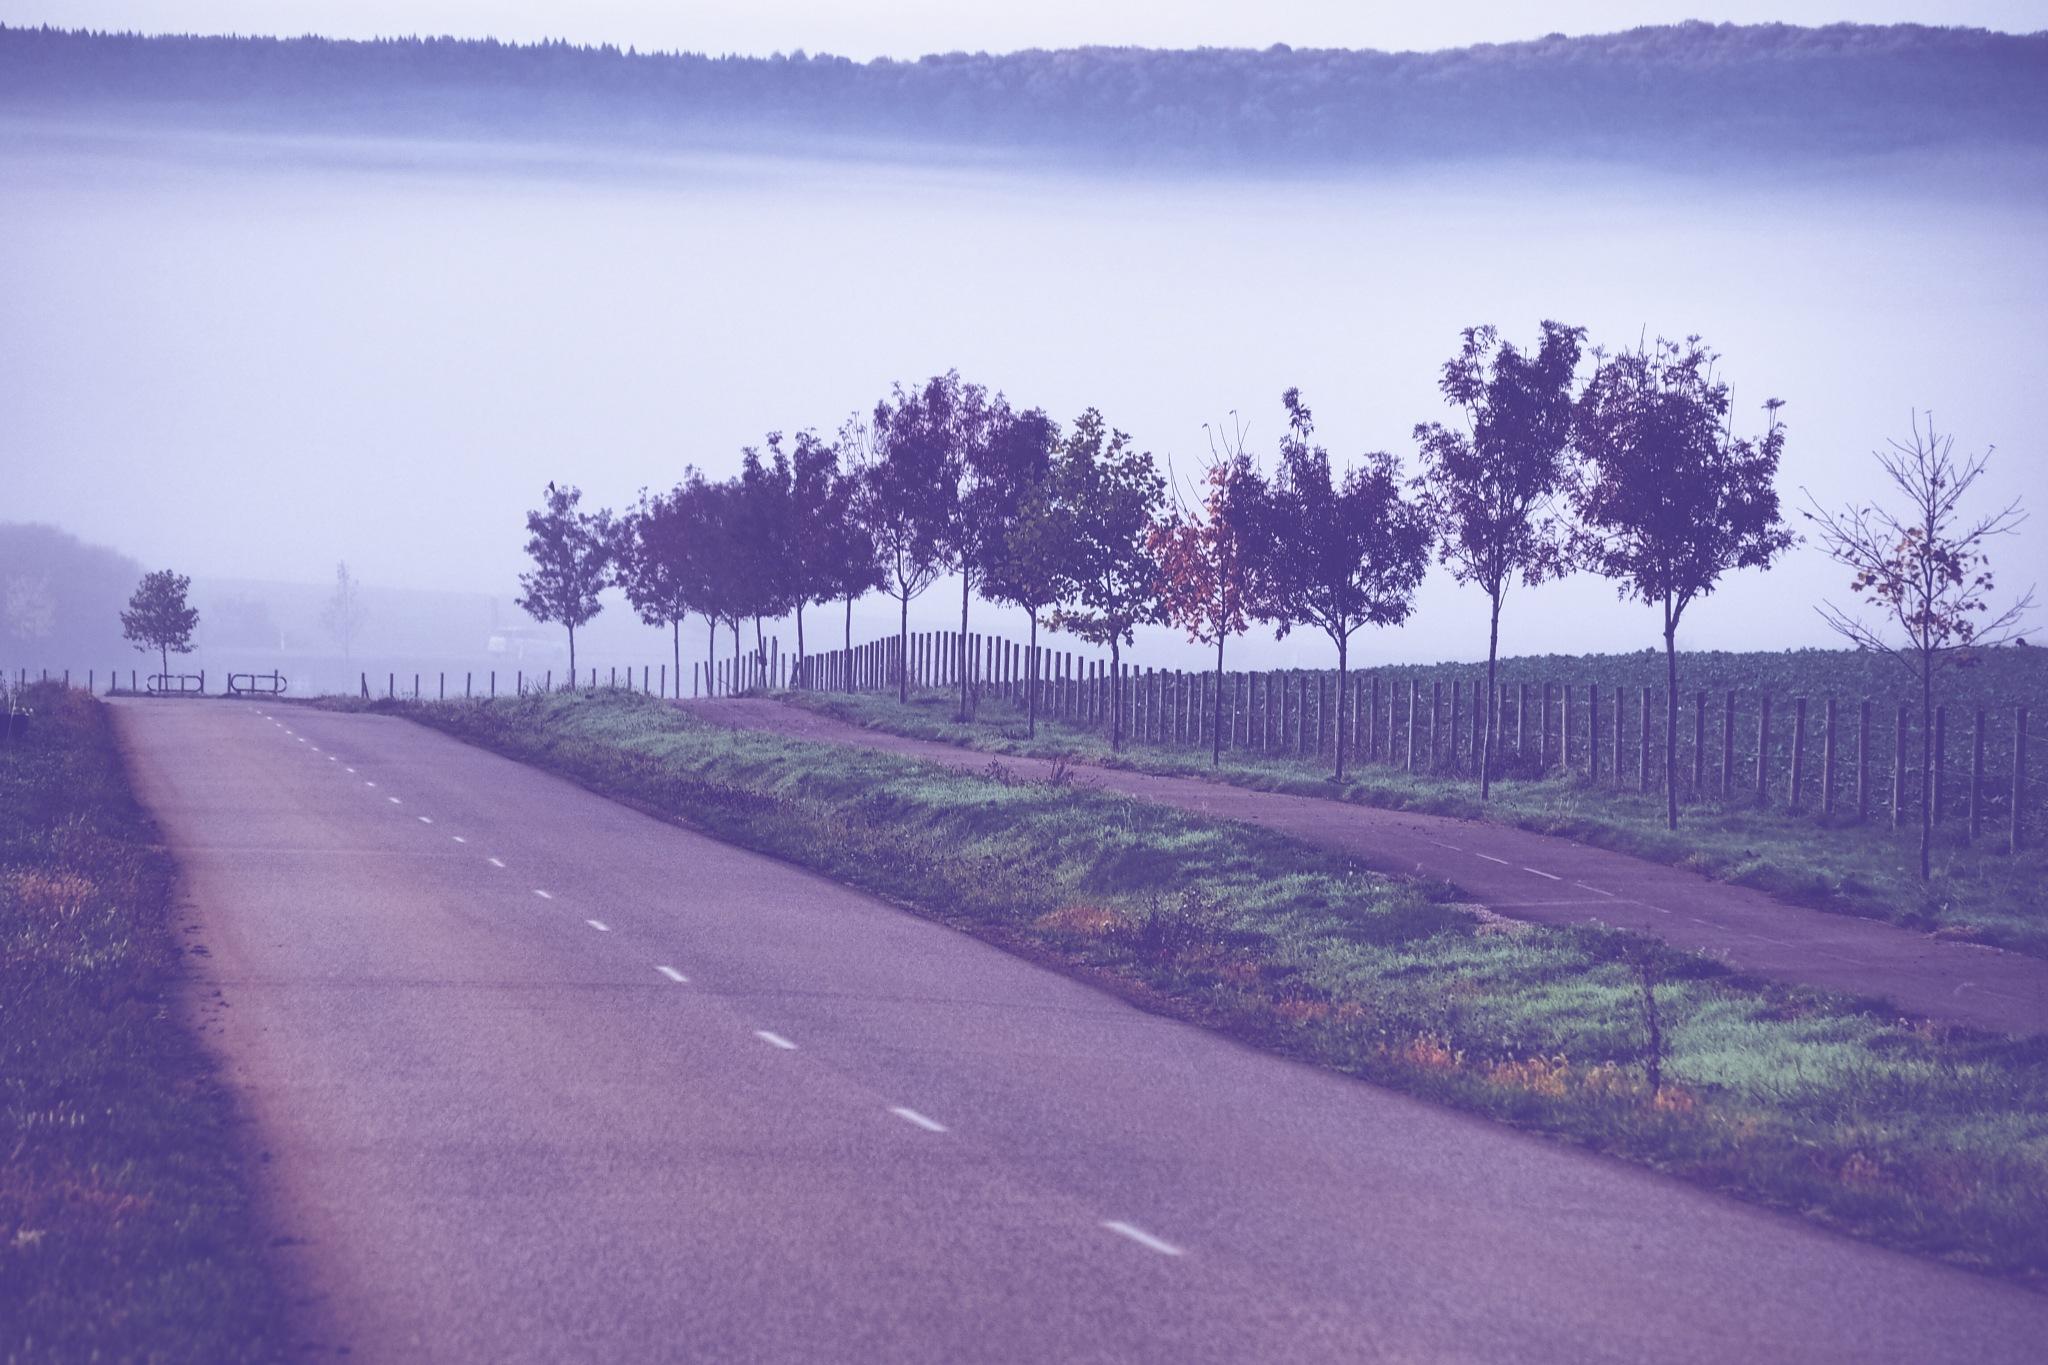 morning mist by alain michel